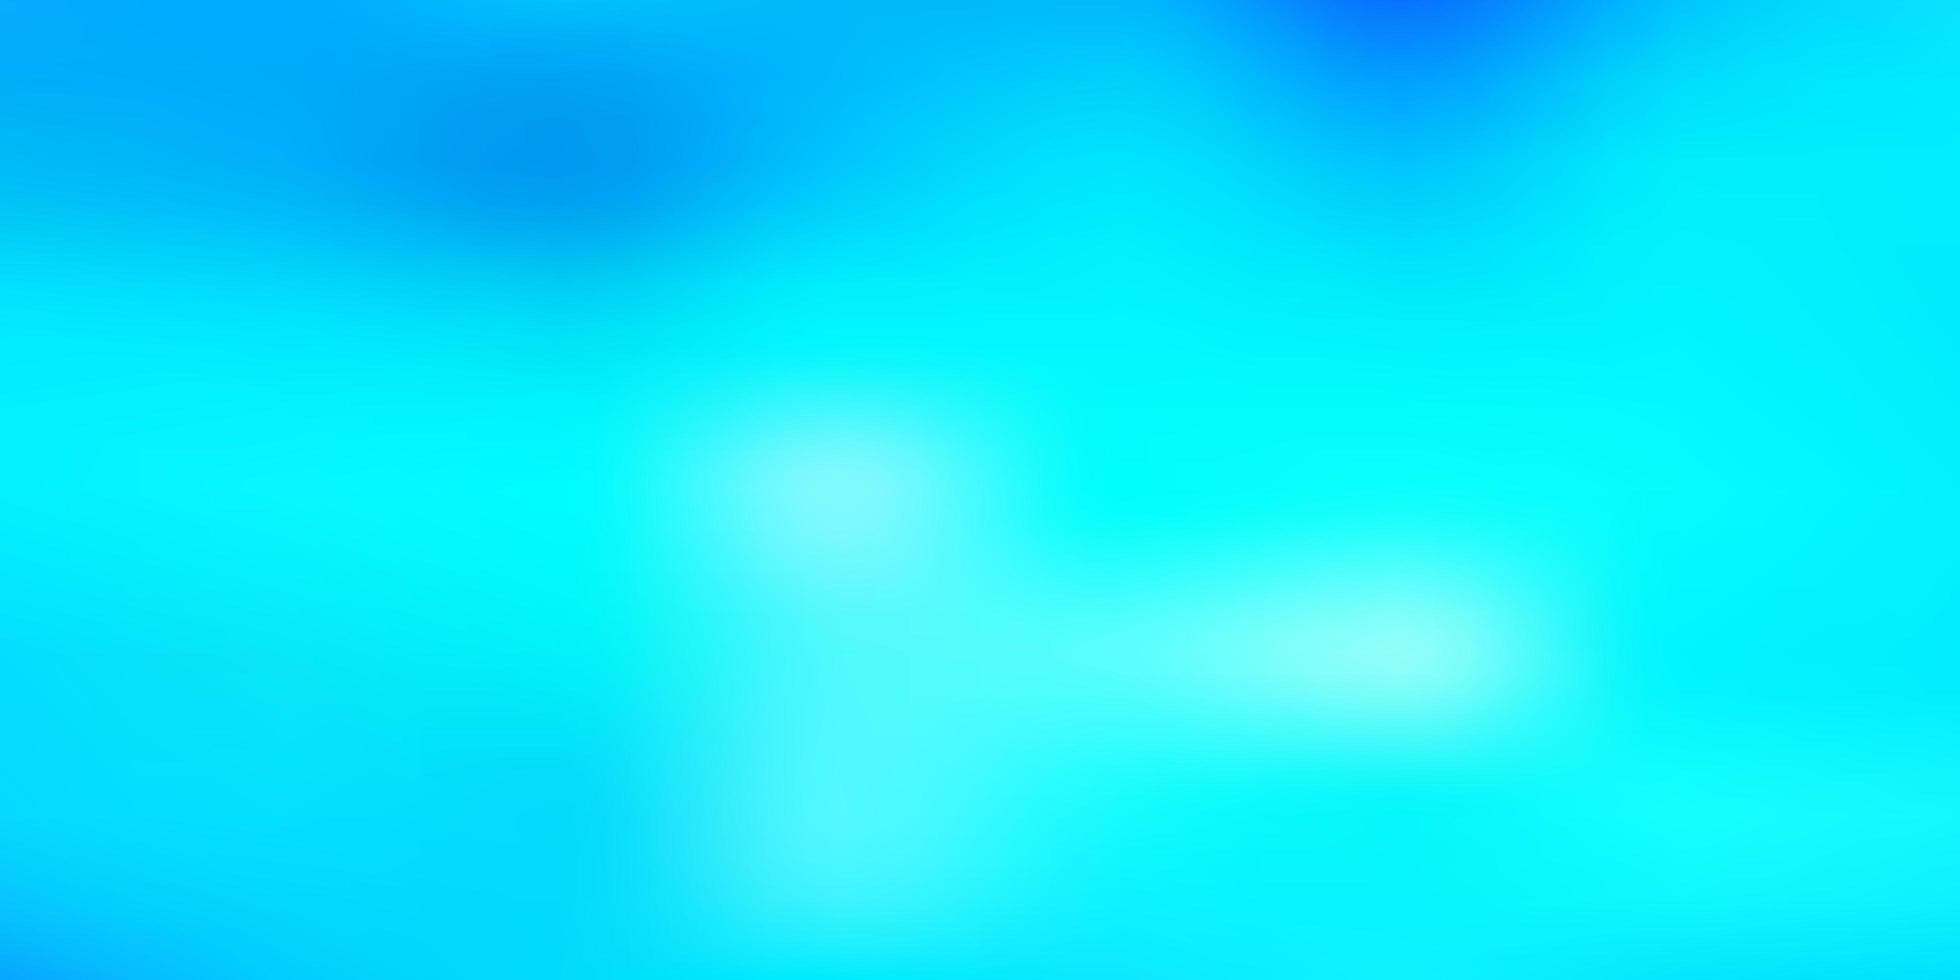 textura turva vector azul claro.